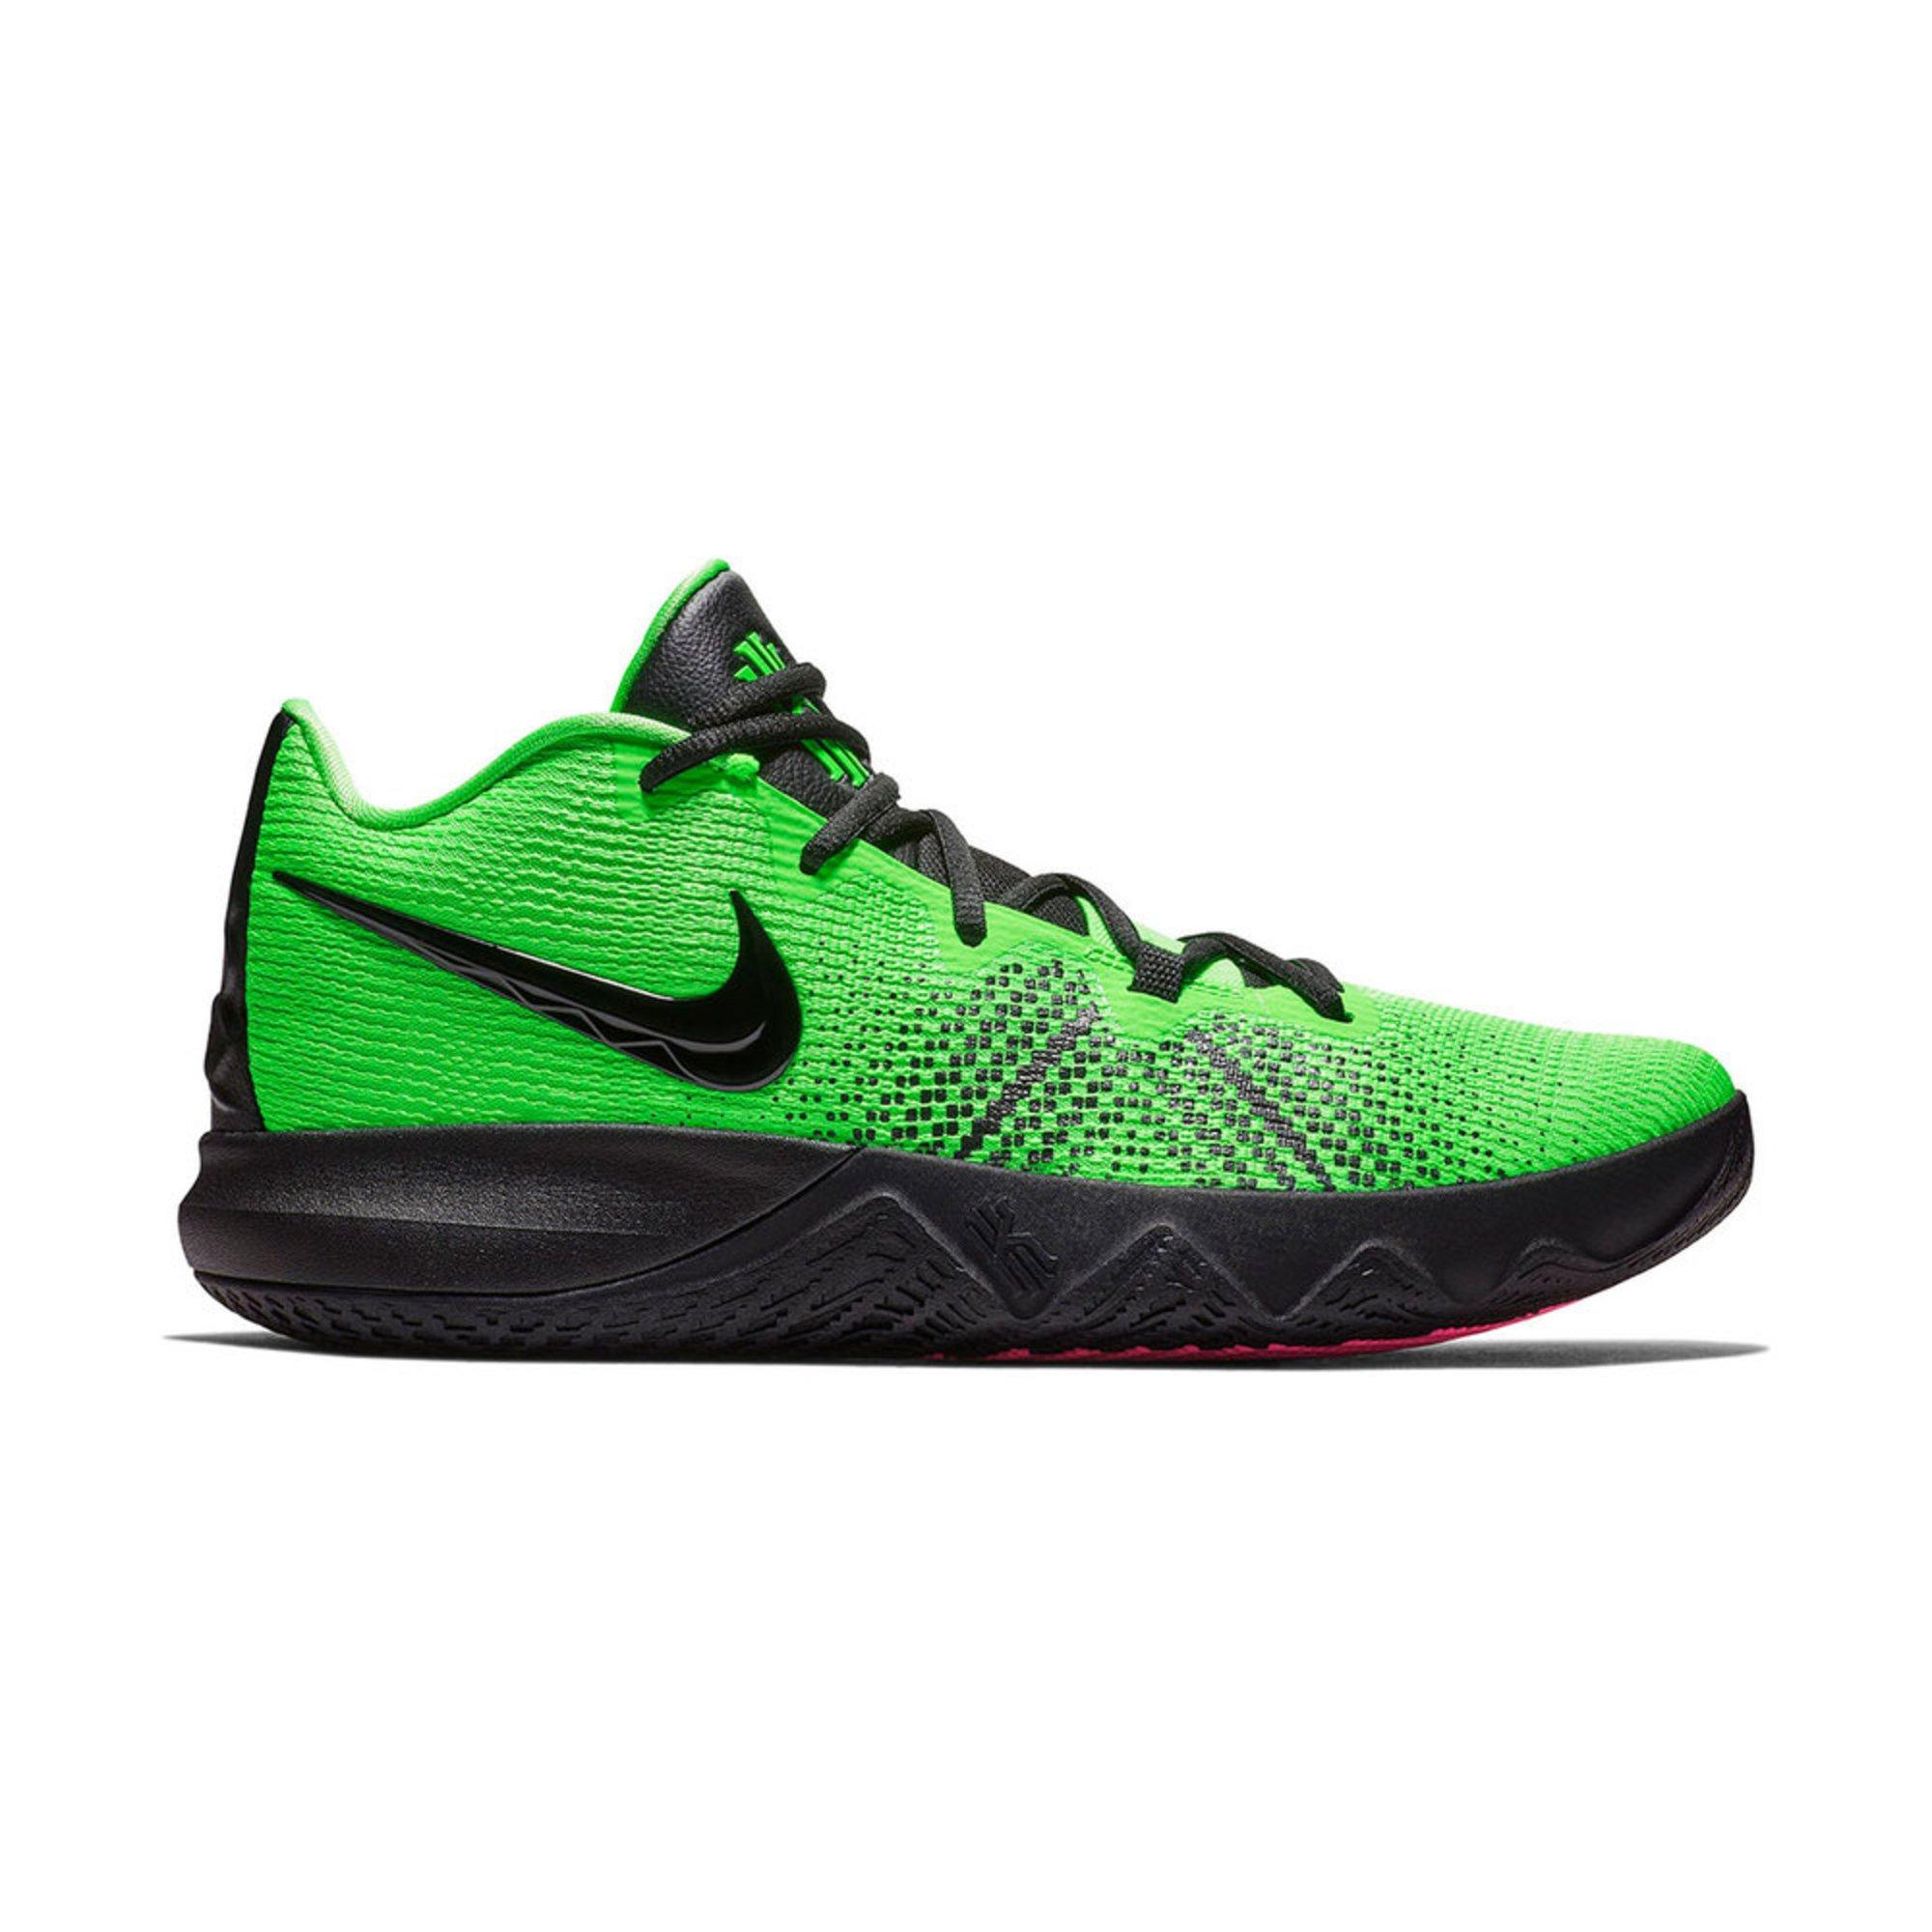 c7975570f Nike Men's Kyrie Flytrap Basketball Shoe | Men's Basketball Shoes ...